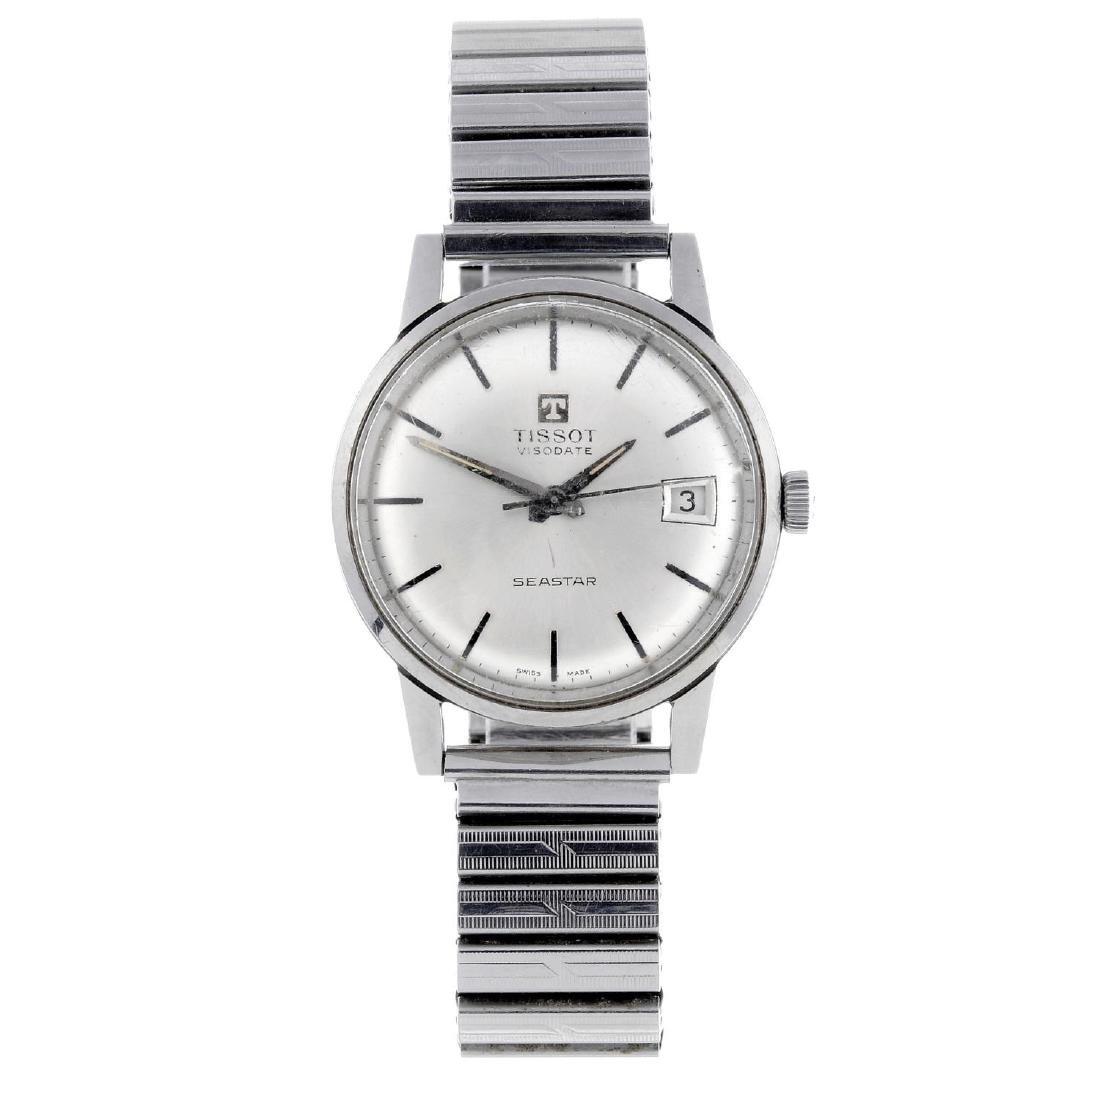 TISSOT - a gentleman's Visodate Seastar bracelet watch.